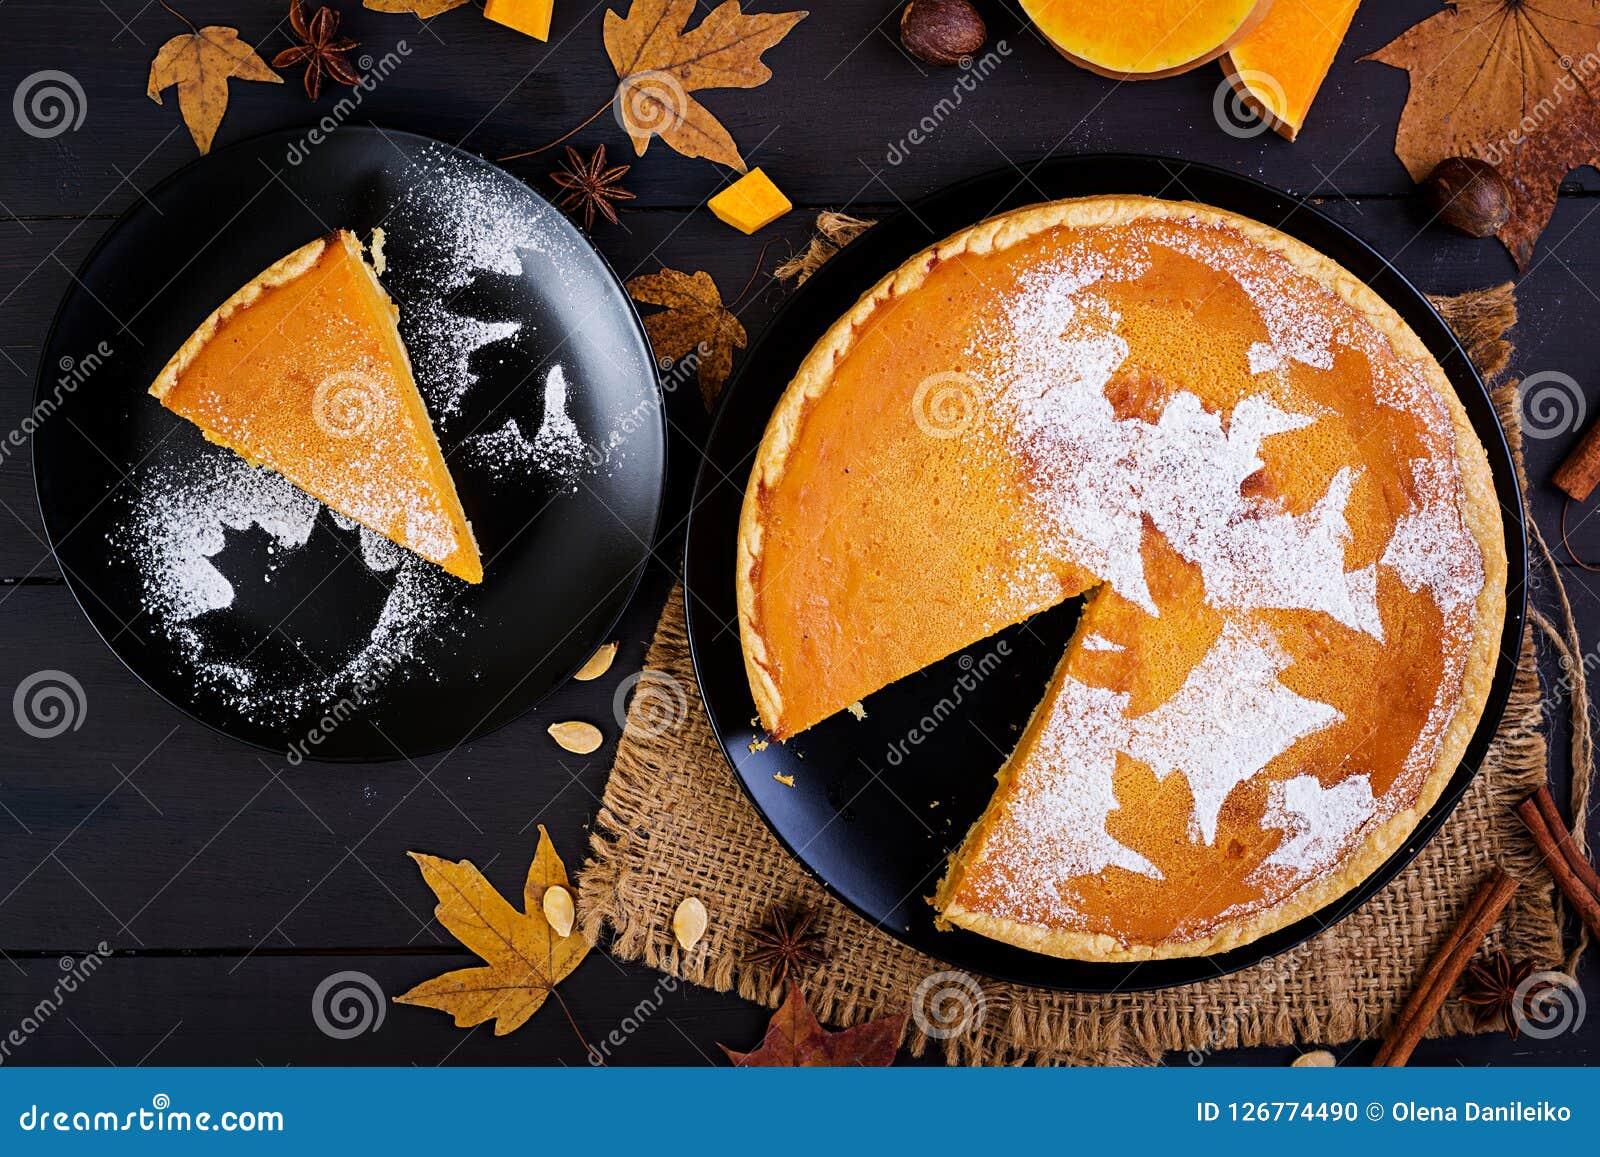 American homemade pumpkin pie with cinnamon and nutmeg